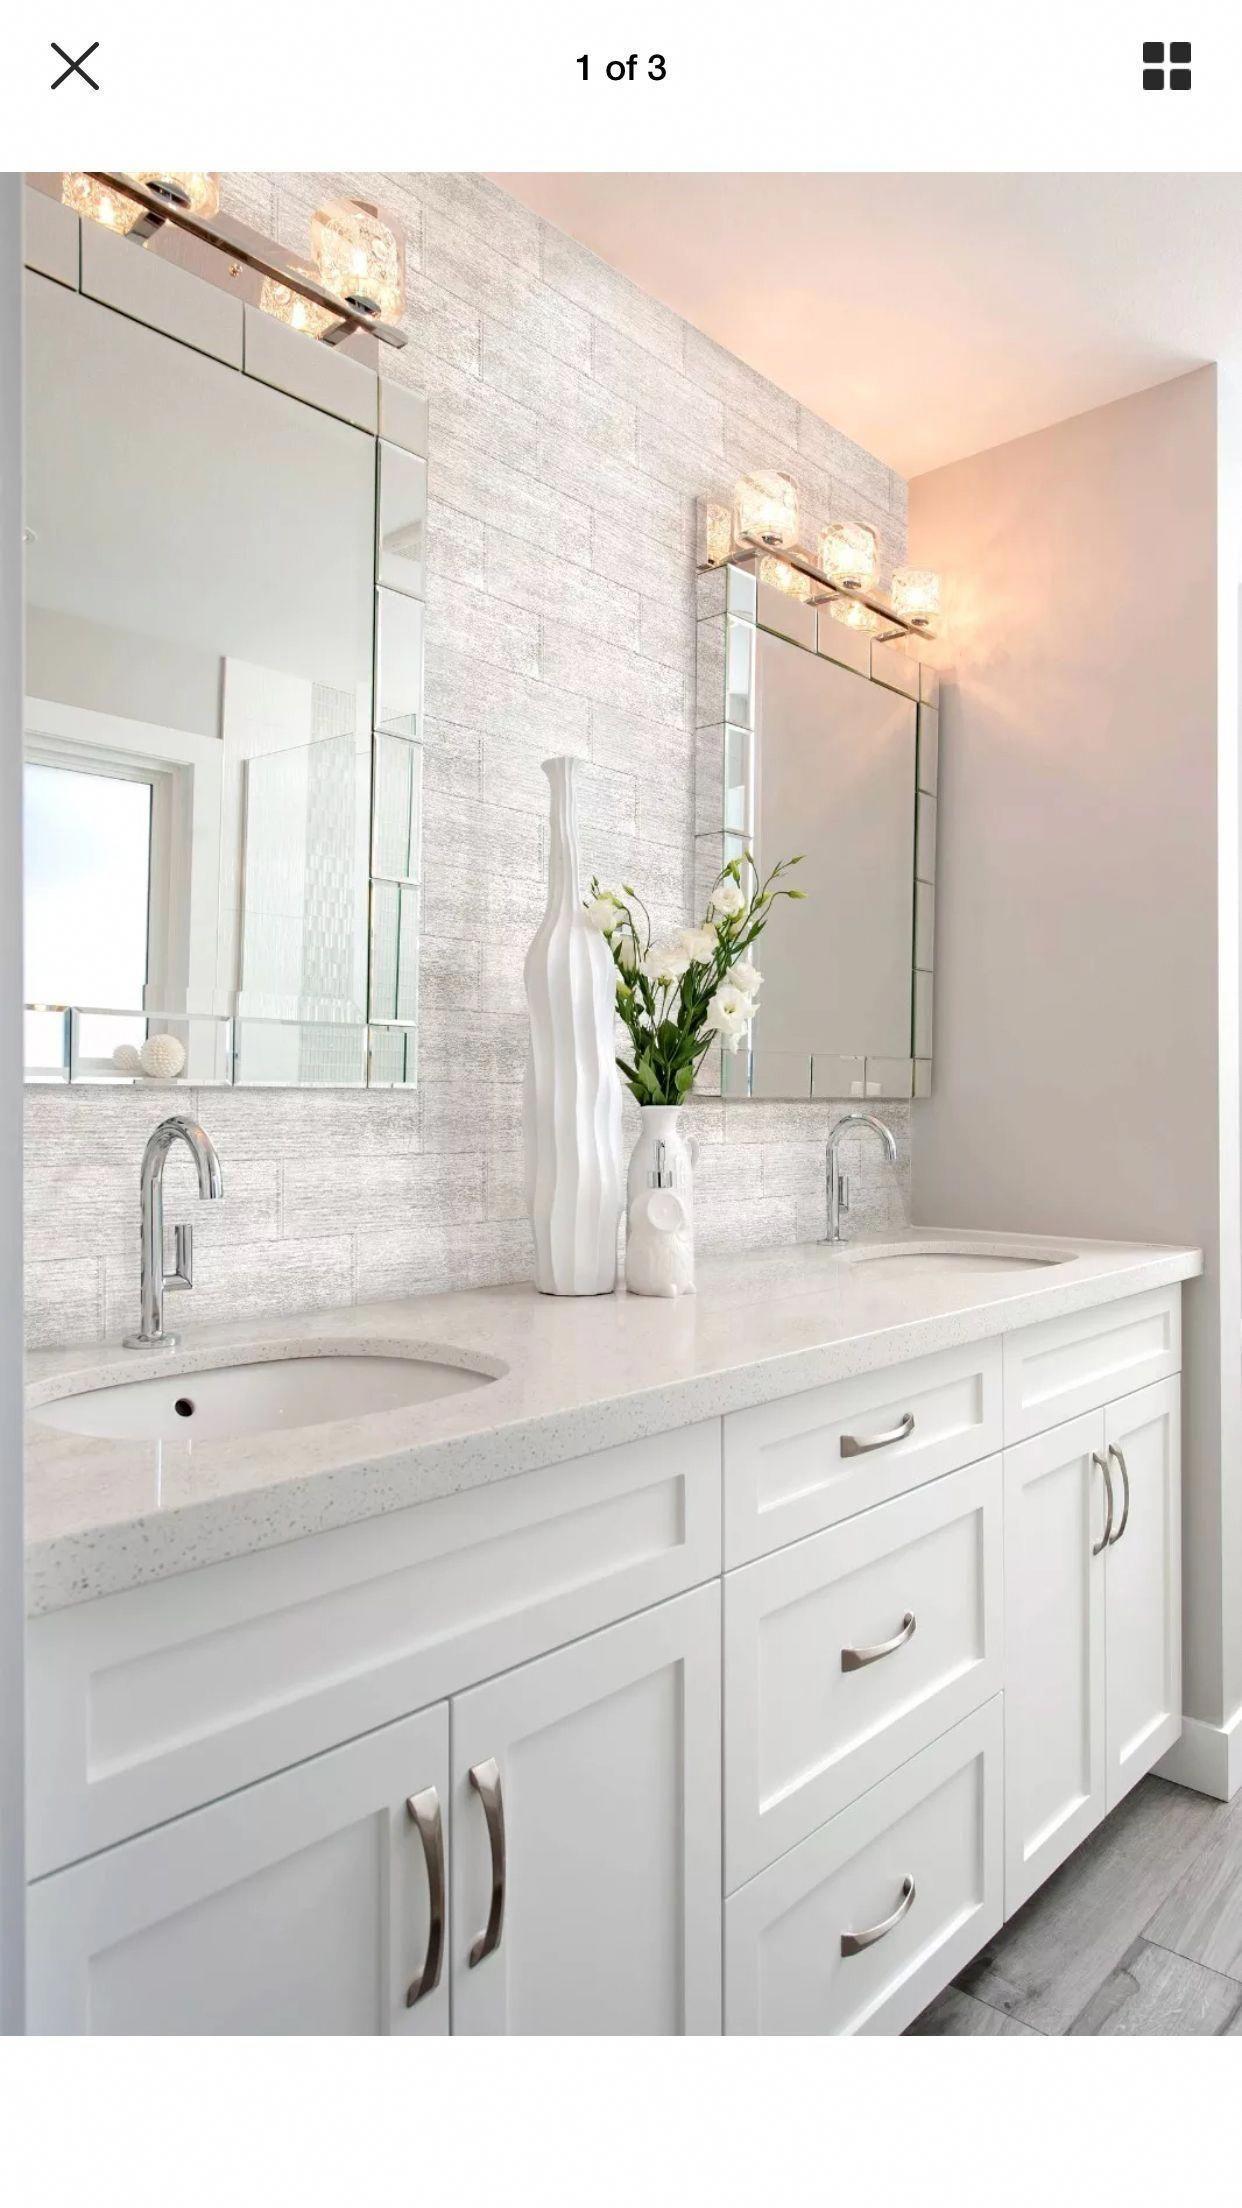 50 Modern Apartment Bathroom Pictures In 2020 Double Vanity Bathroom